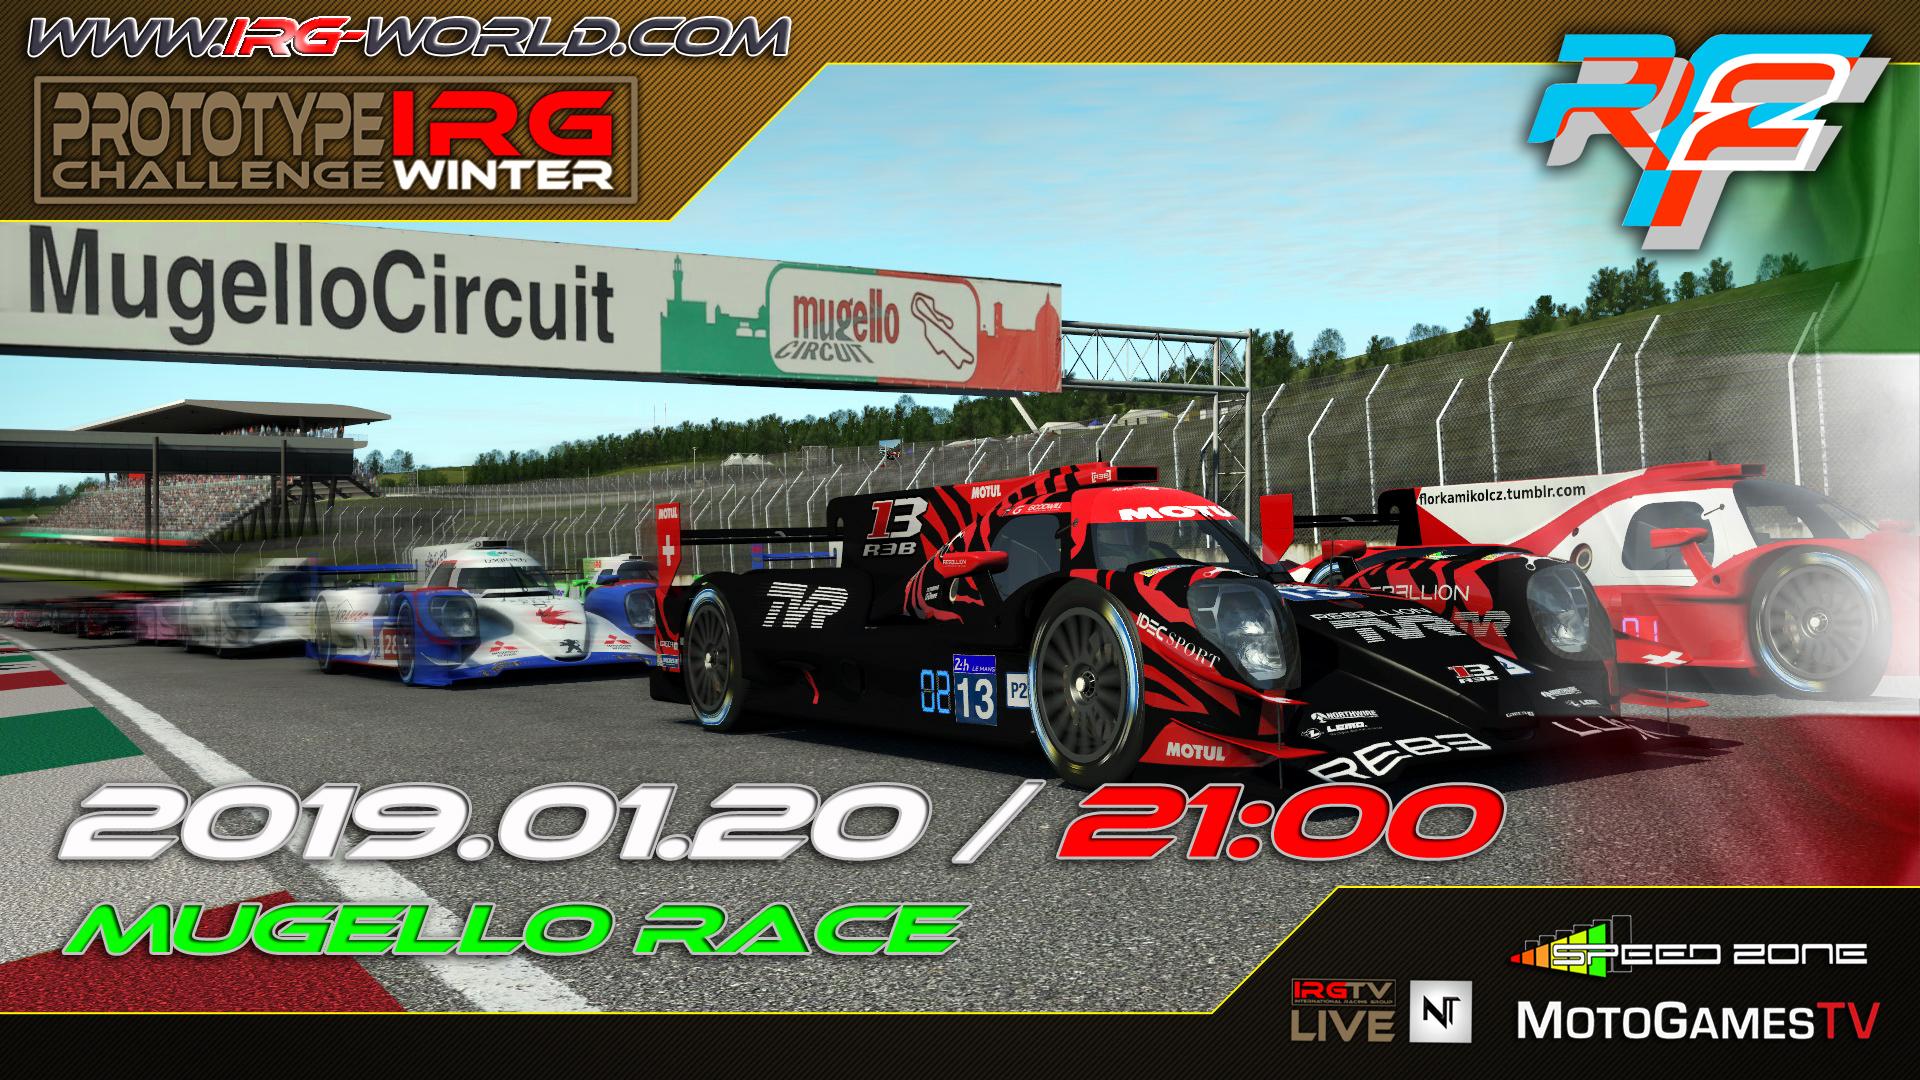 lmp_mugello_race_01.jpg